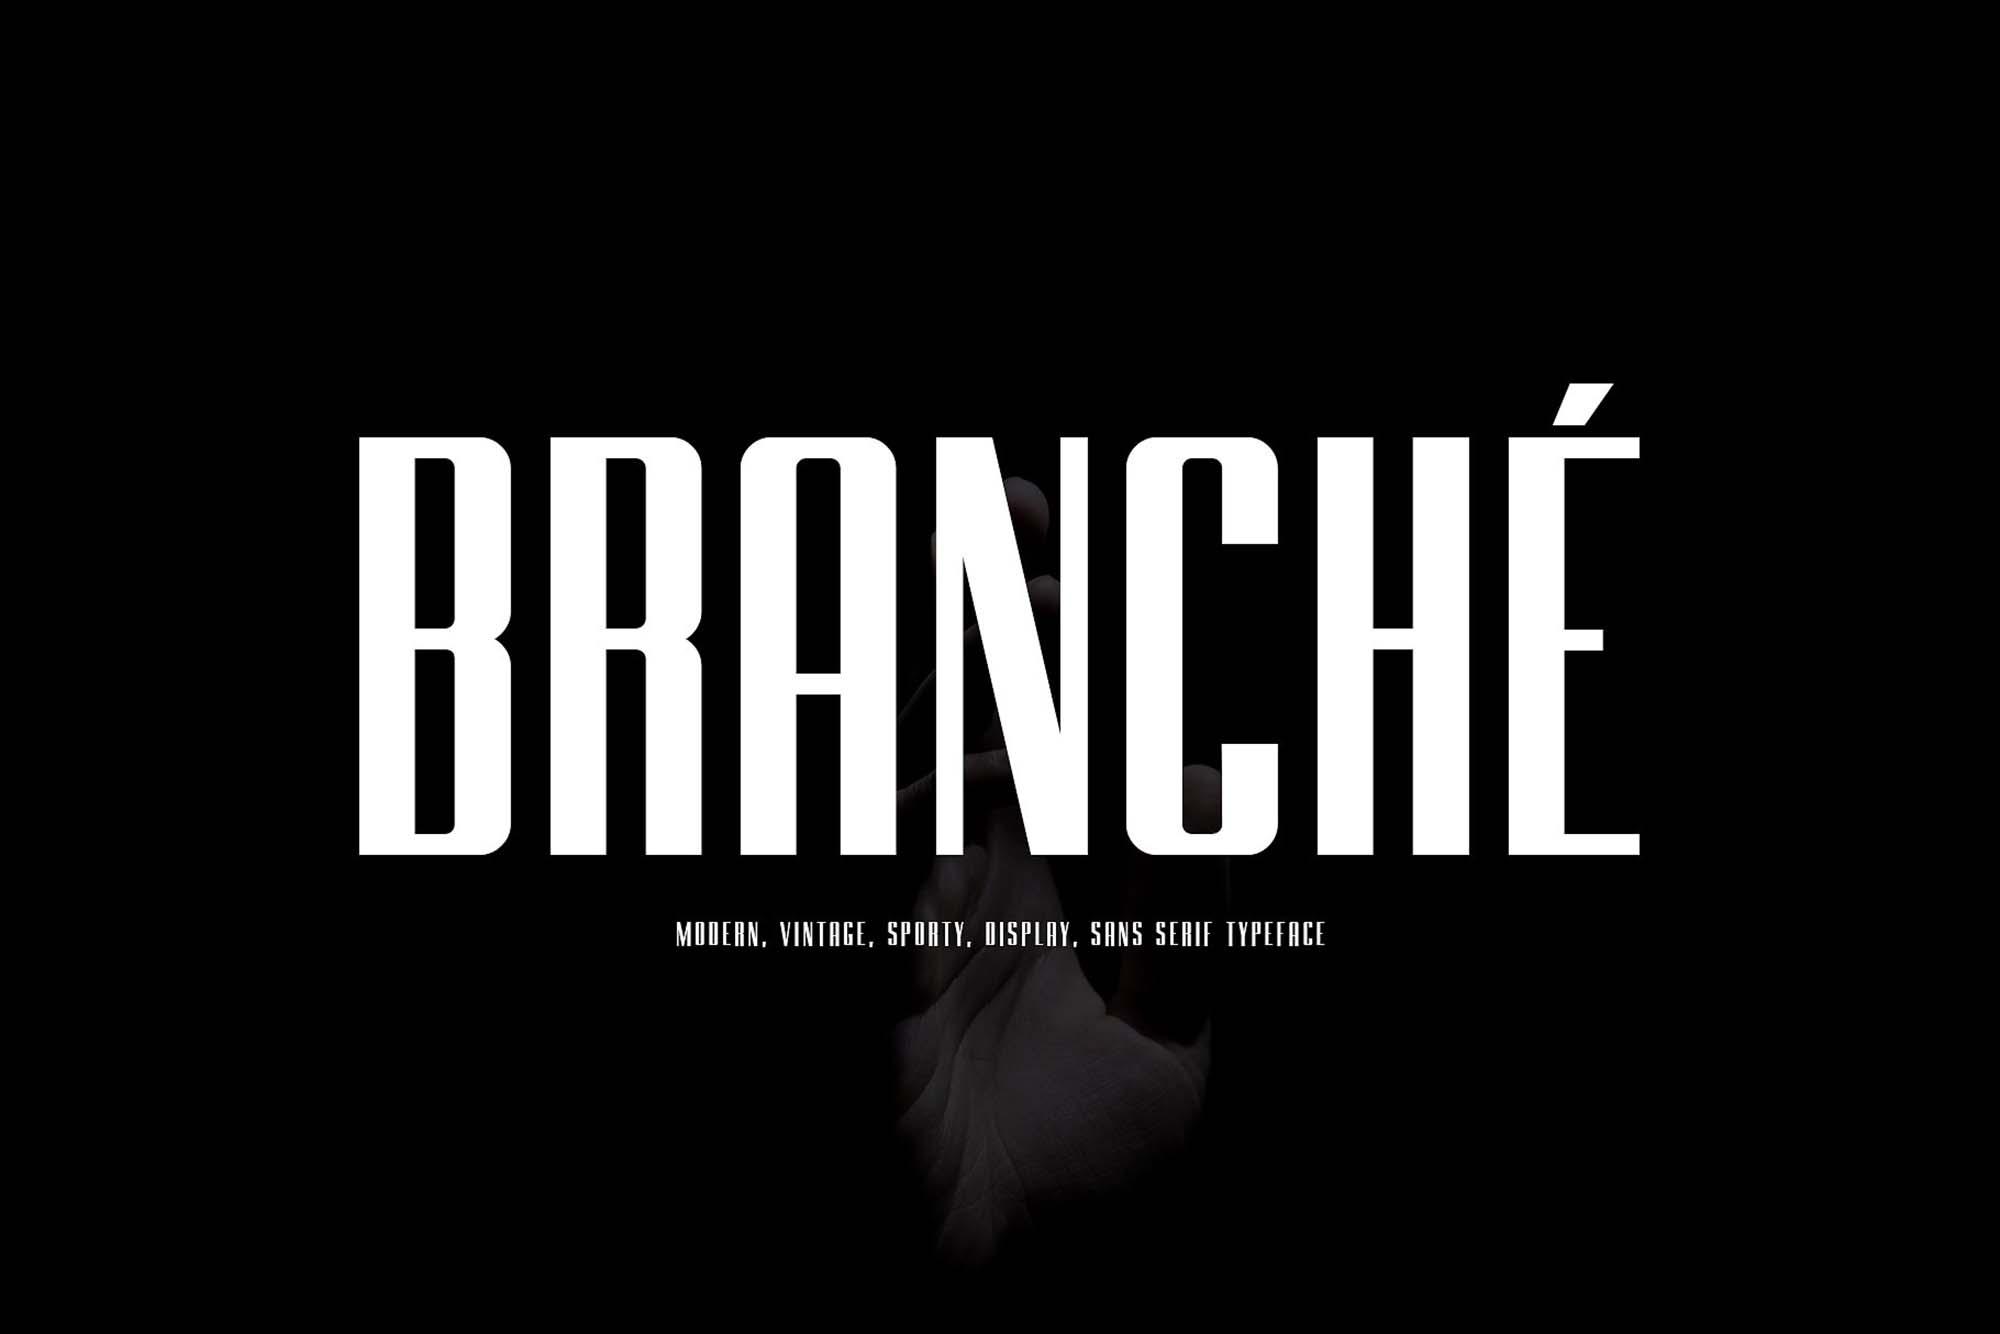 Branche Typeface